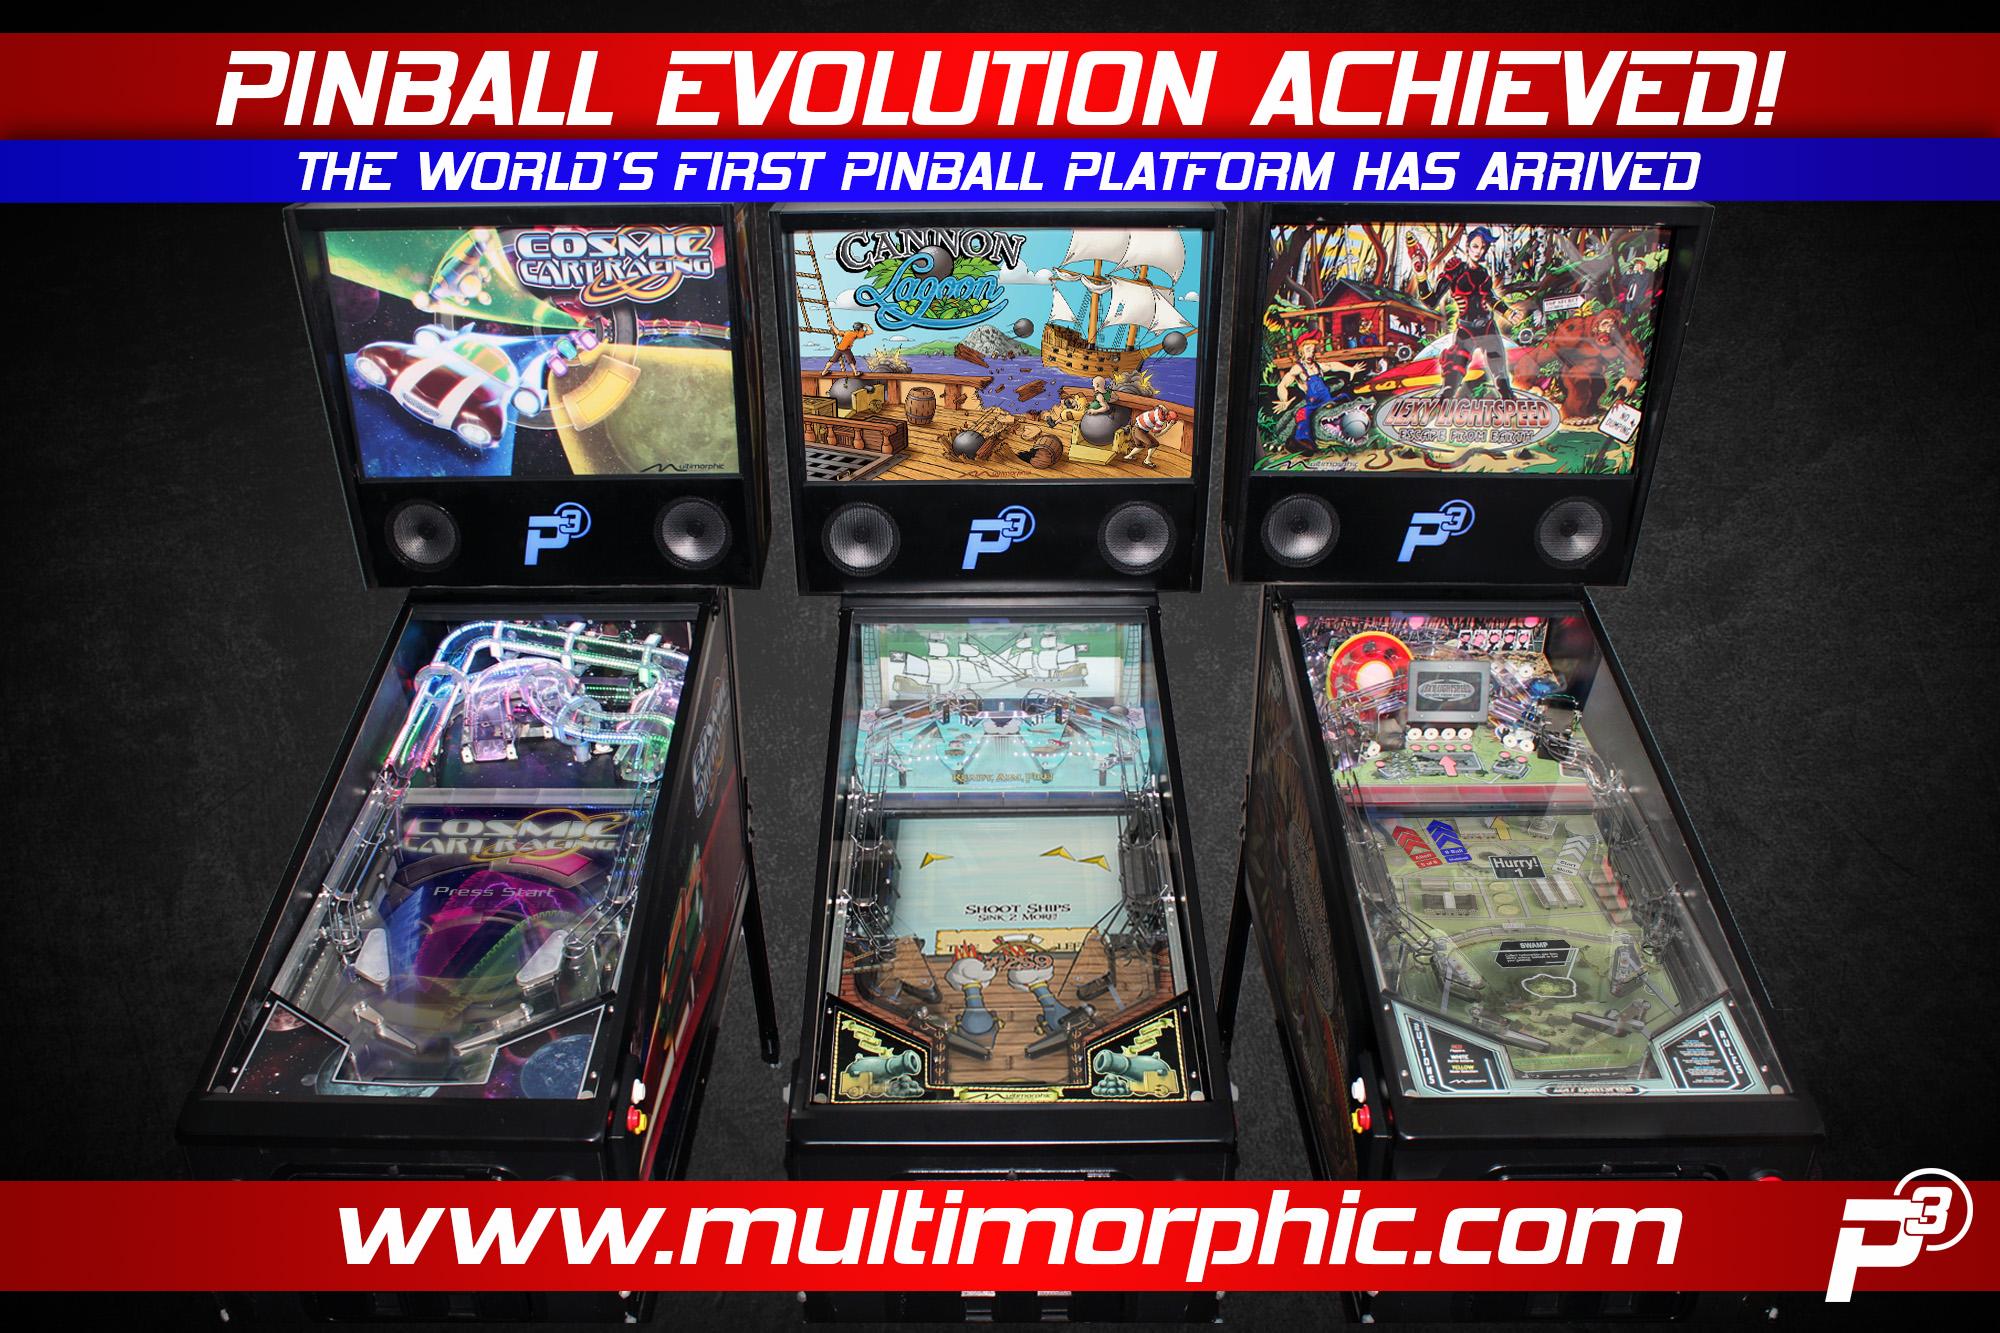 Pinball Evolution Achieved! - Multimorphic, Inc